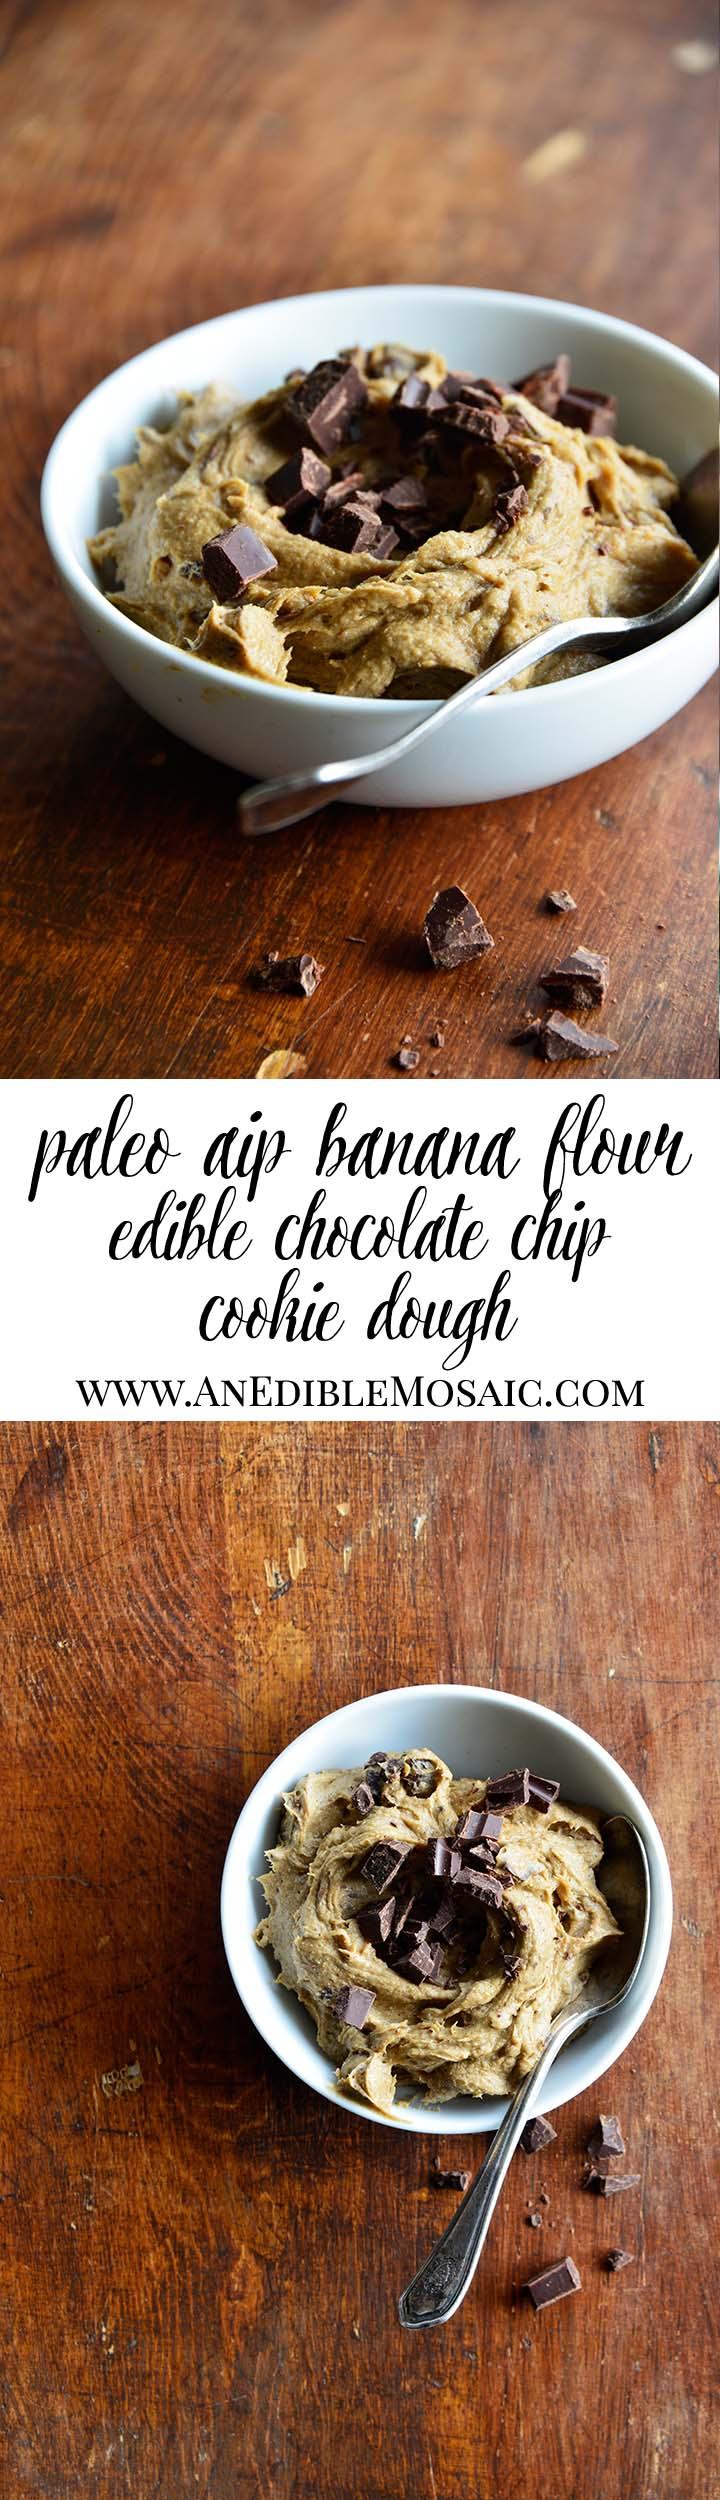 Paleo AIP Banana Flour Chocolate Chip Edible Cookie Dough Long Pin